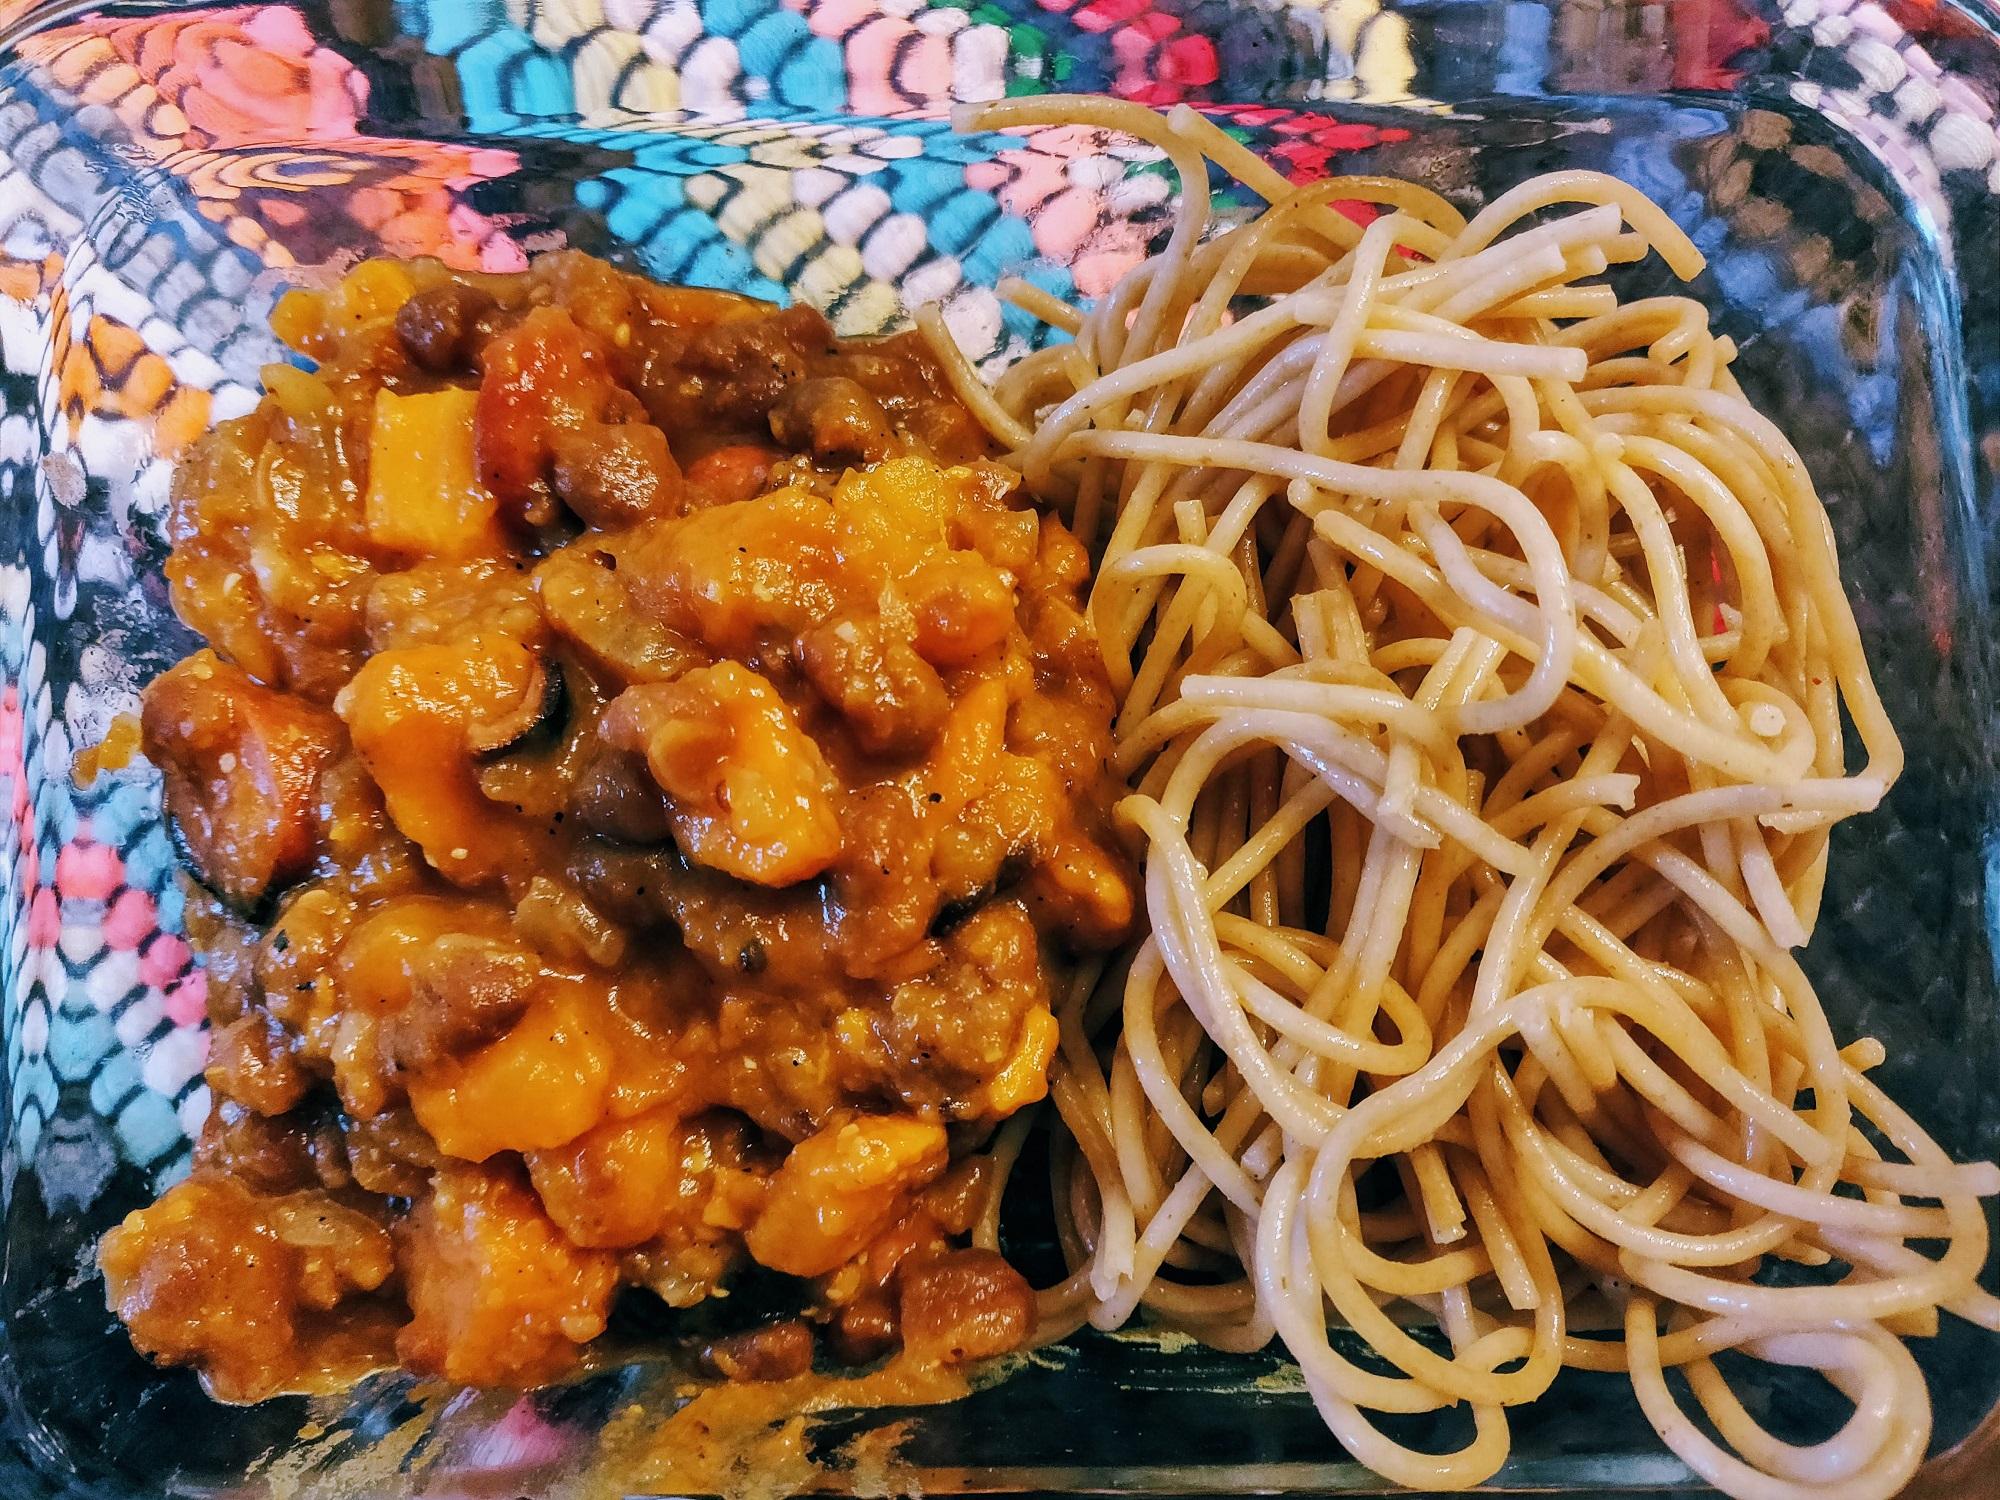 Franks & Beans & Sweet Potatoes